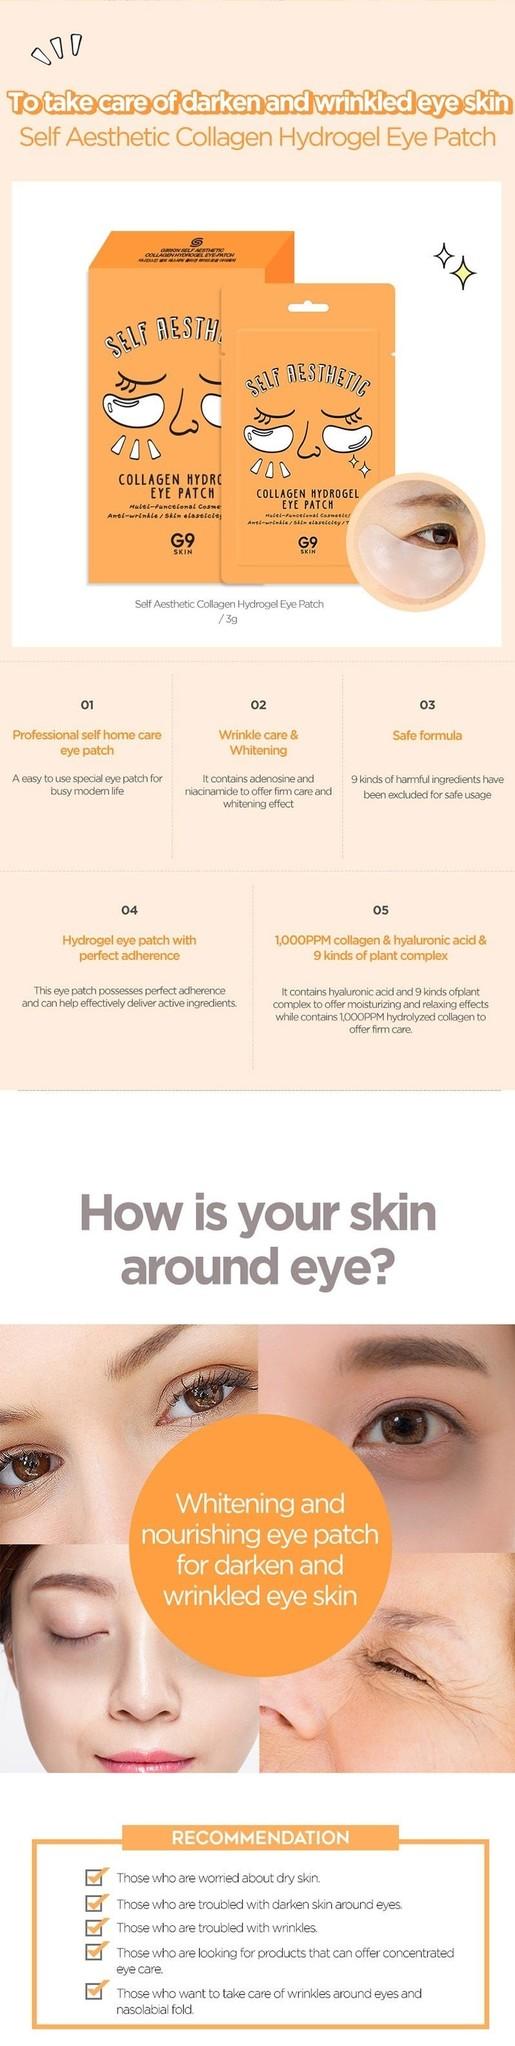 Self Aesthetic Collagen Hydrogel Eye Patch-4